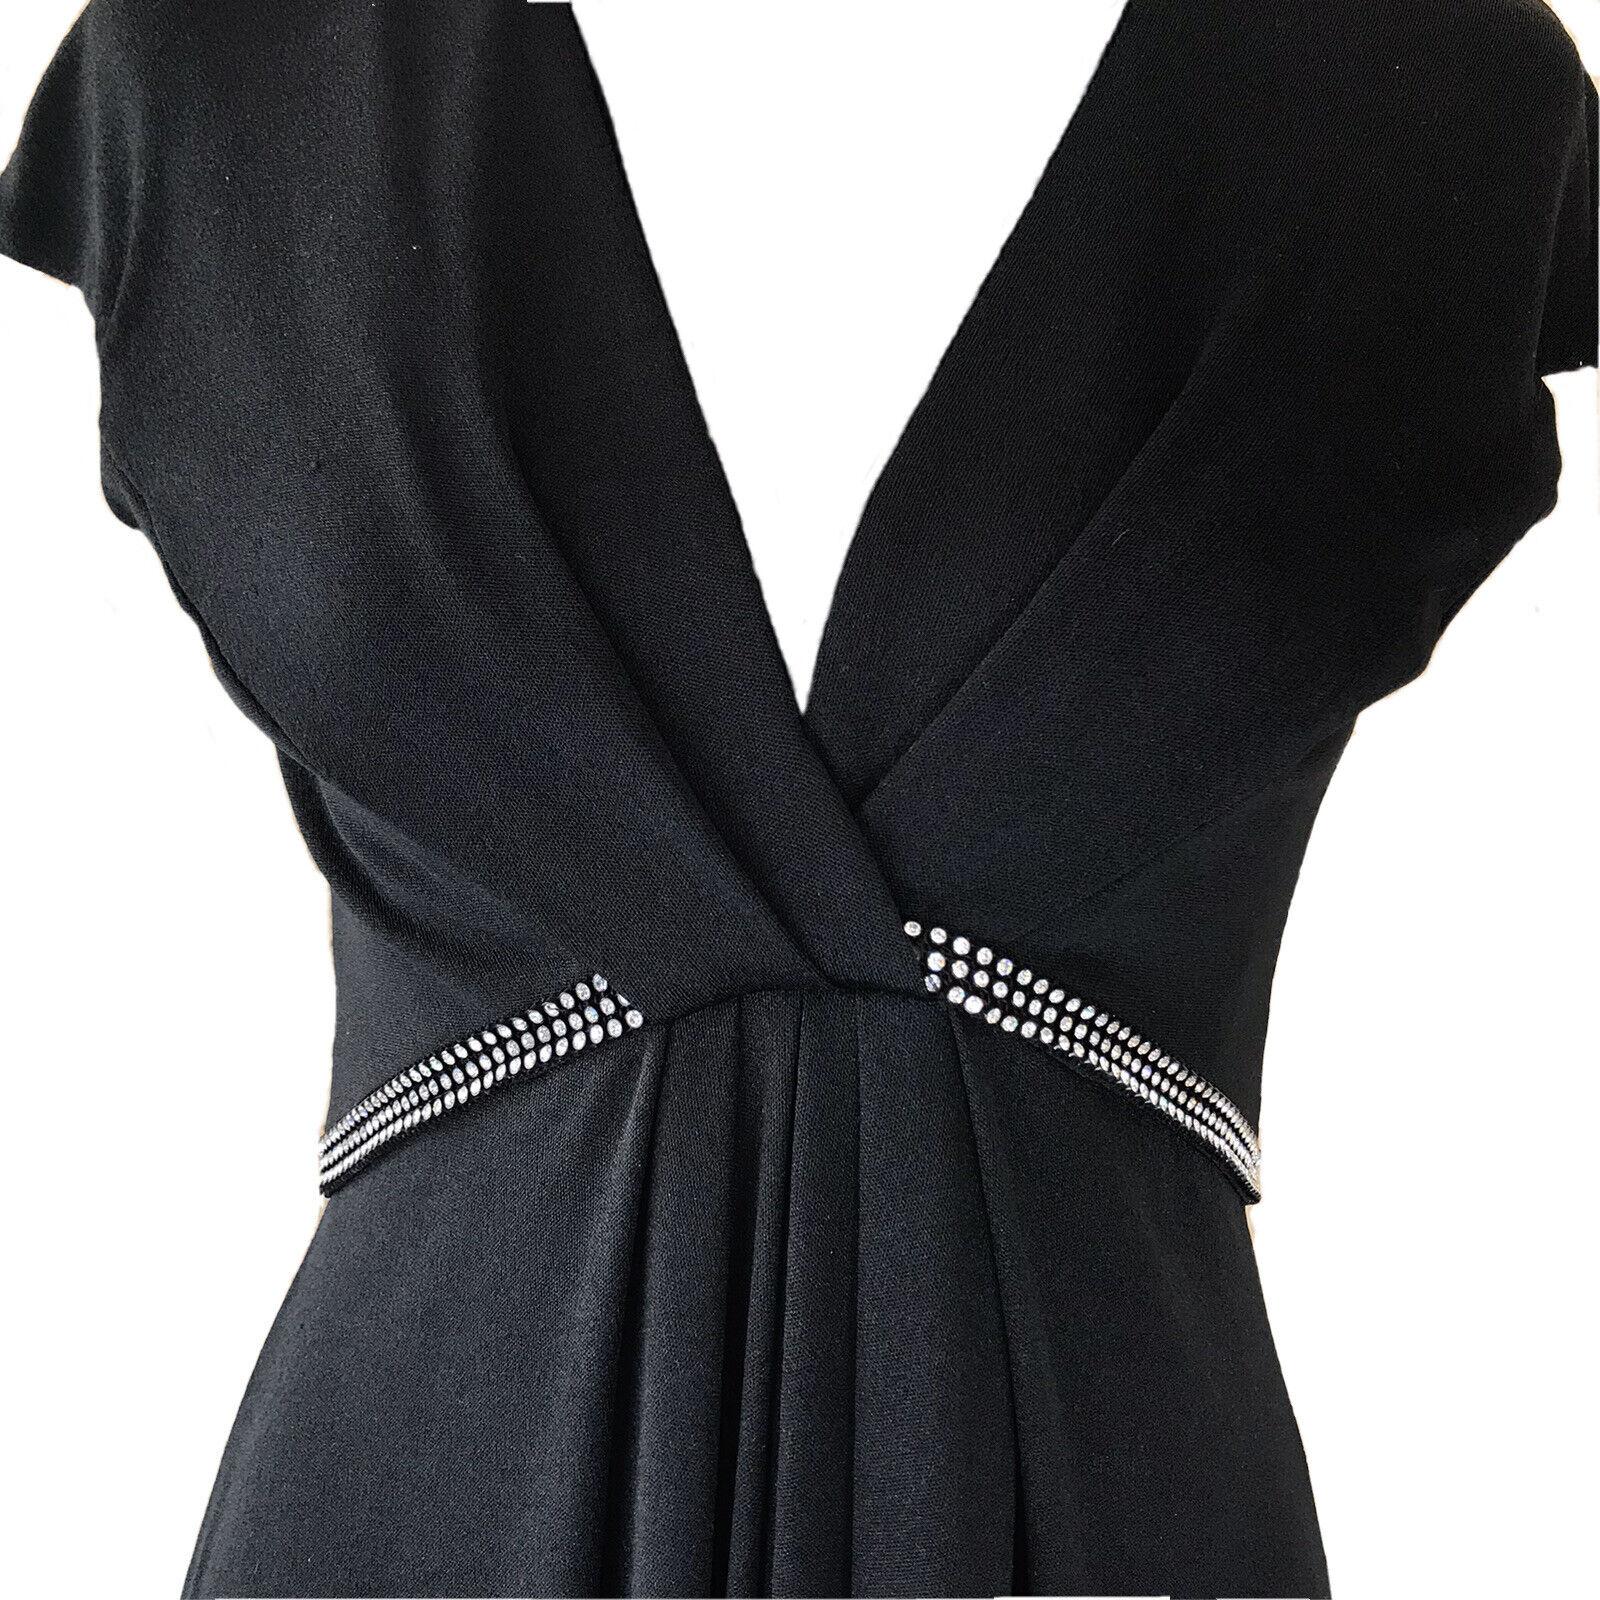 Vintage Luis Estevez Dress Eva Gabor Look Label B… - image 9